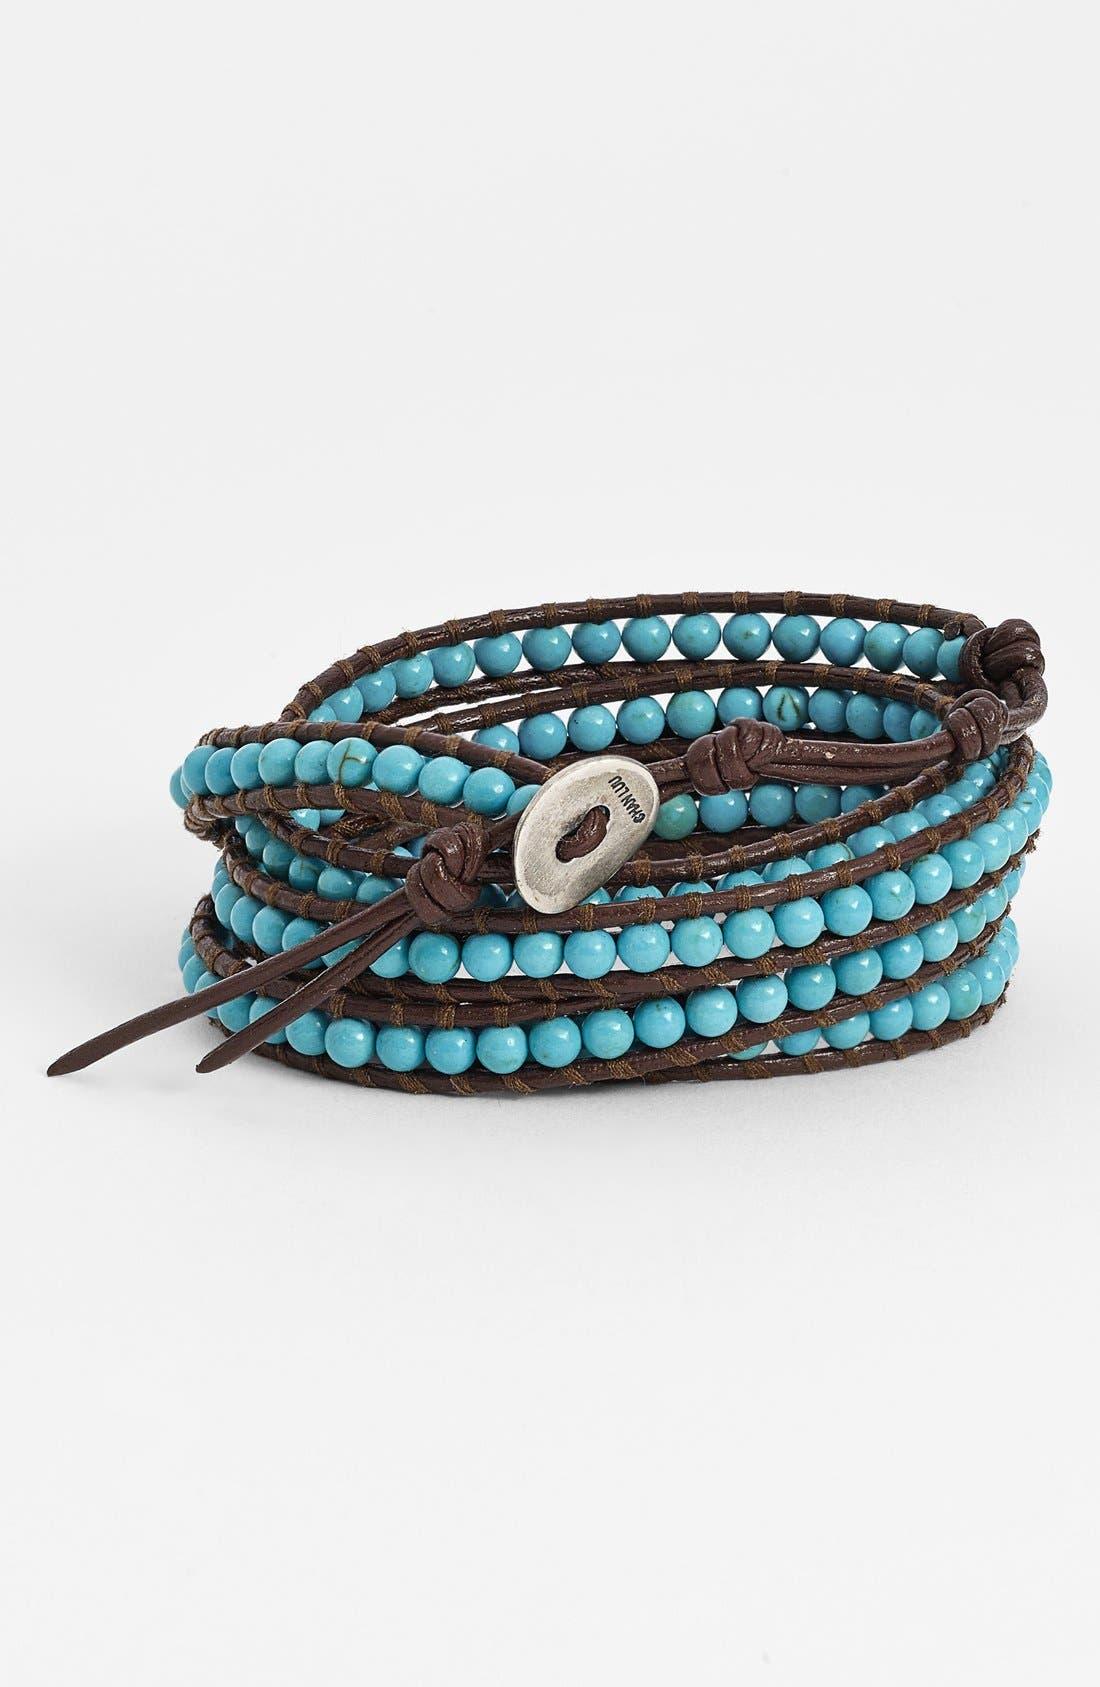 Main Image - Chan Luu Beaded Leather Wrap Bracelet